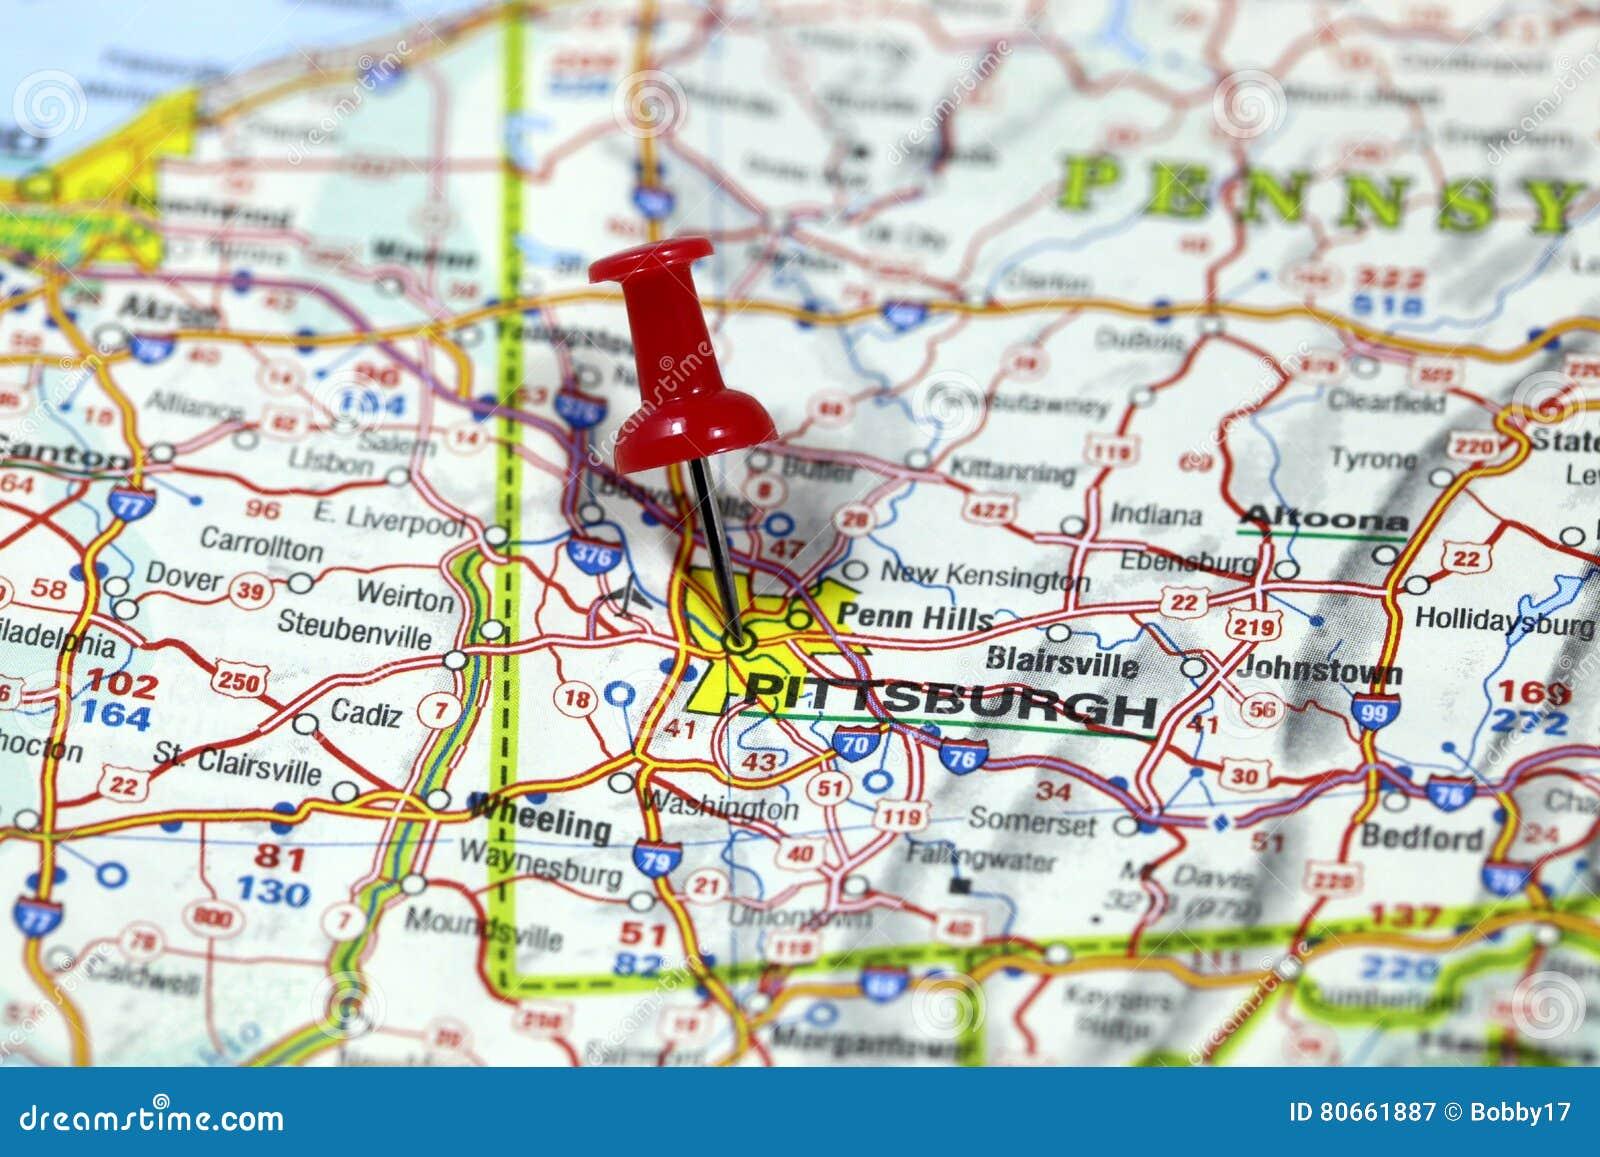 Pennsylvania In Usa Map.Pittsburgh In Pennsylvania Usa Stock Image Image Of Globe Road